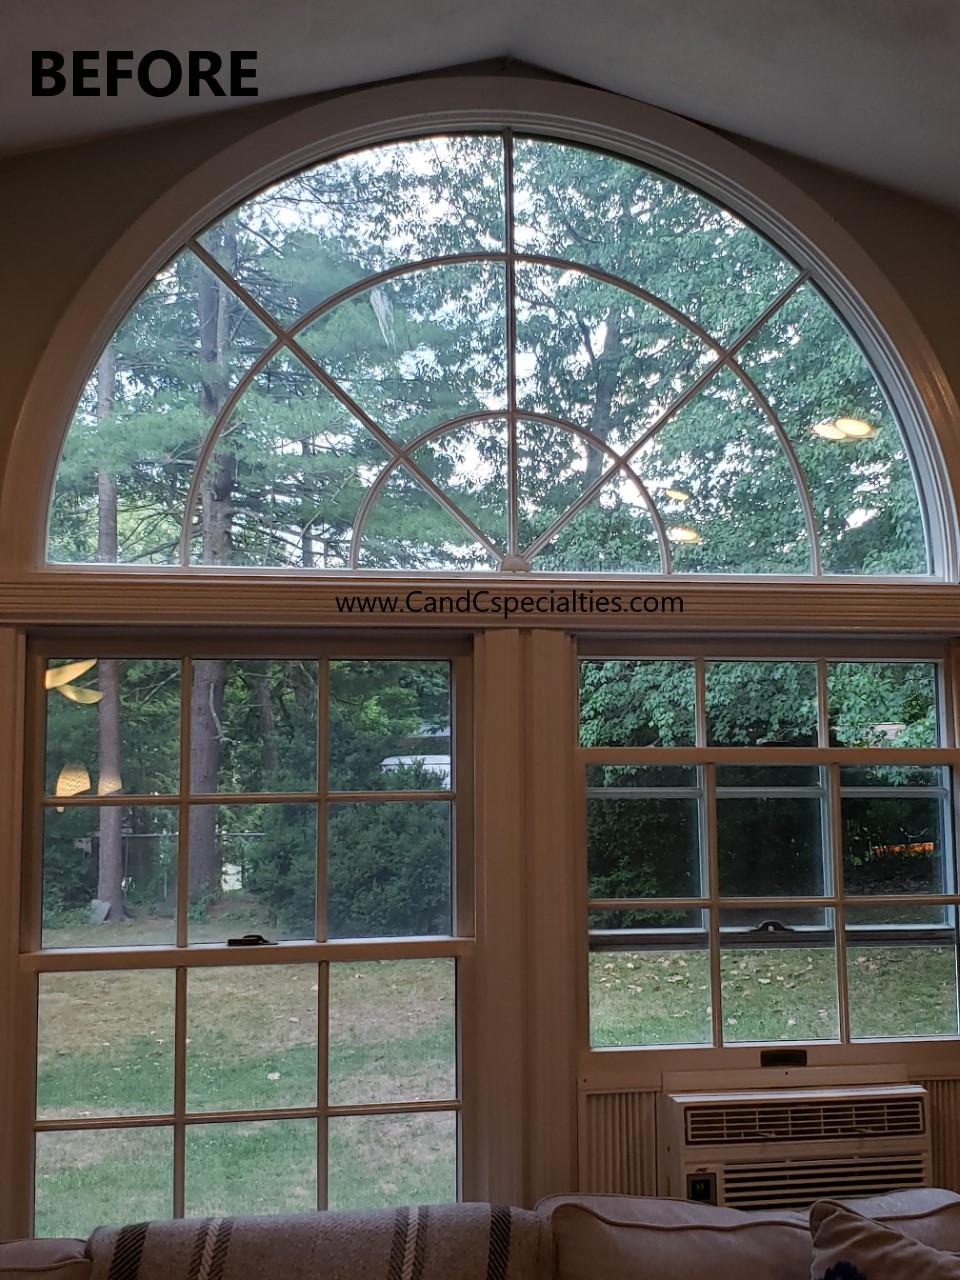 WINDOW TRANSOM BEFORE